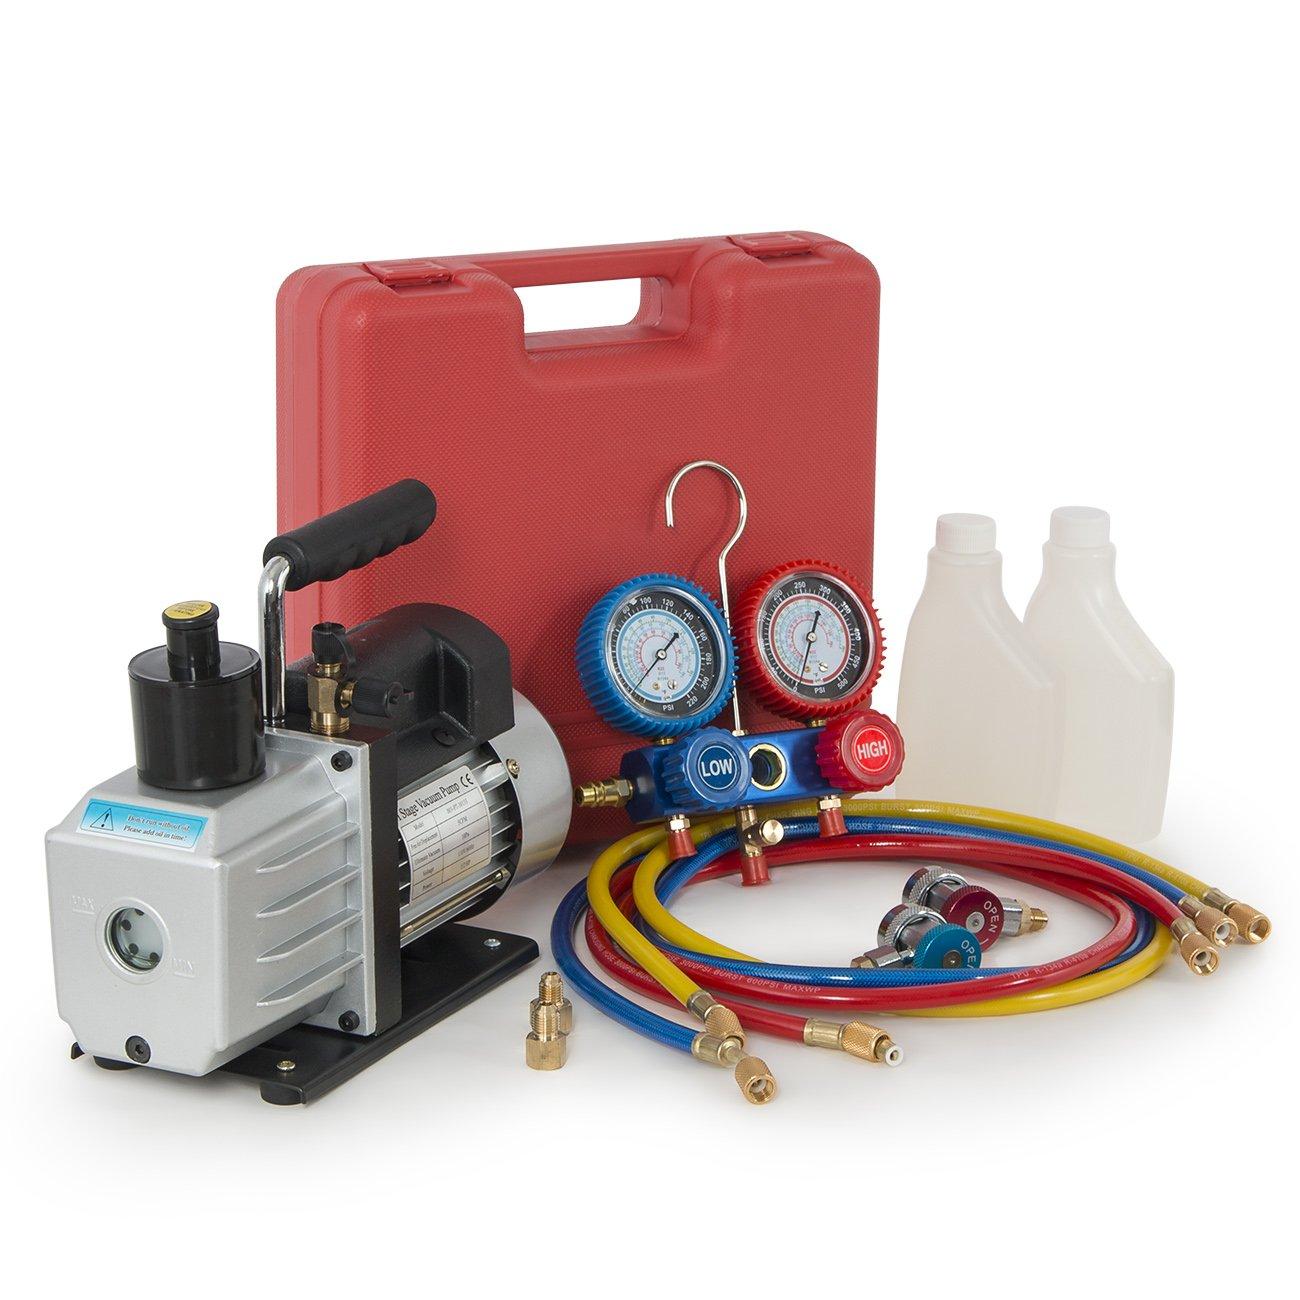 R134a Manifold + 5CFM Vacuum Pump